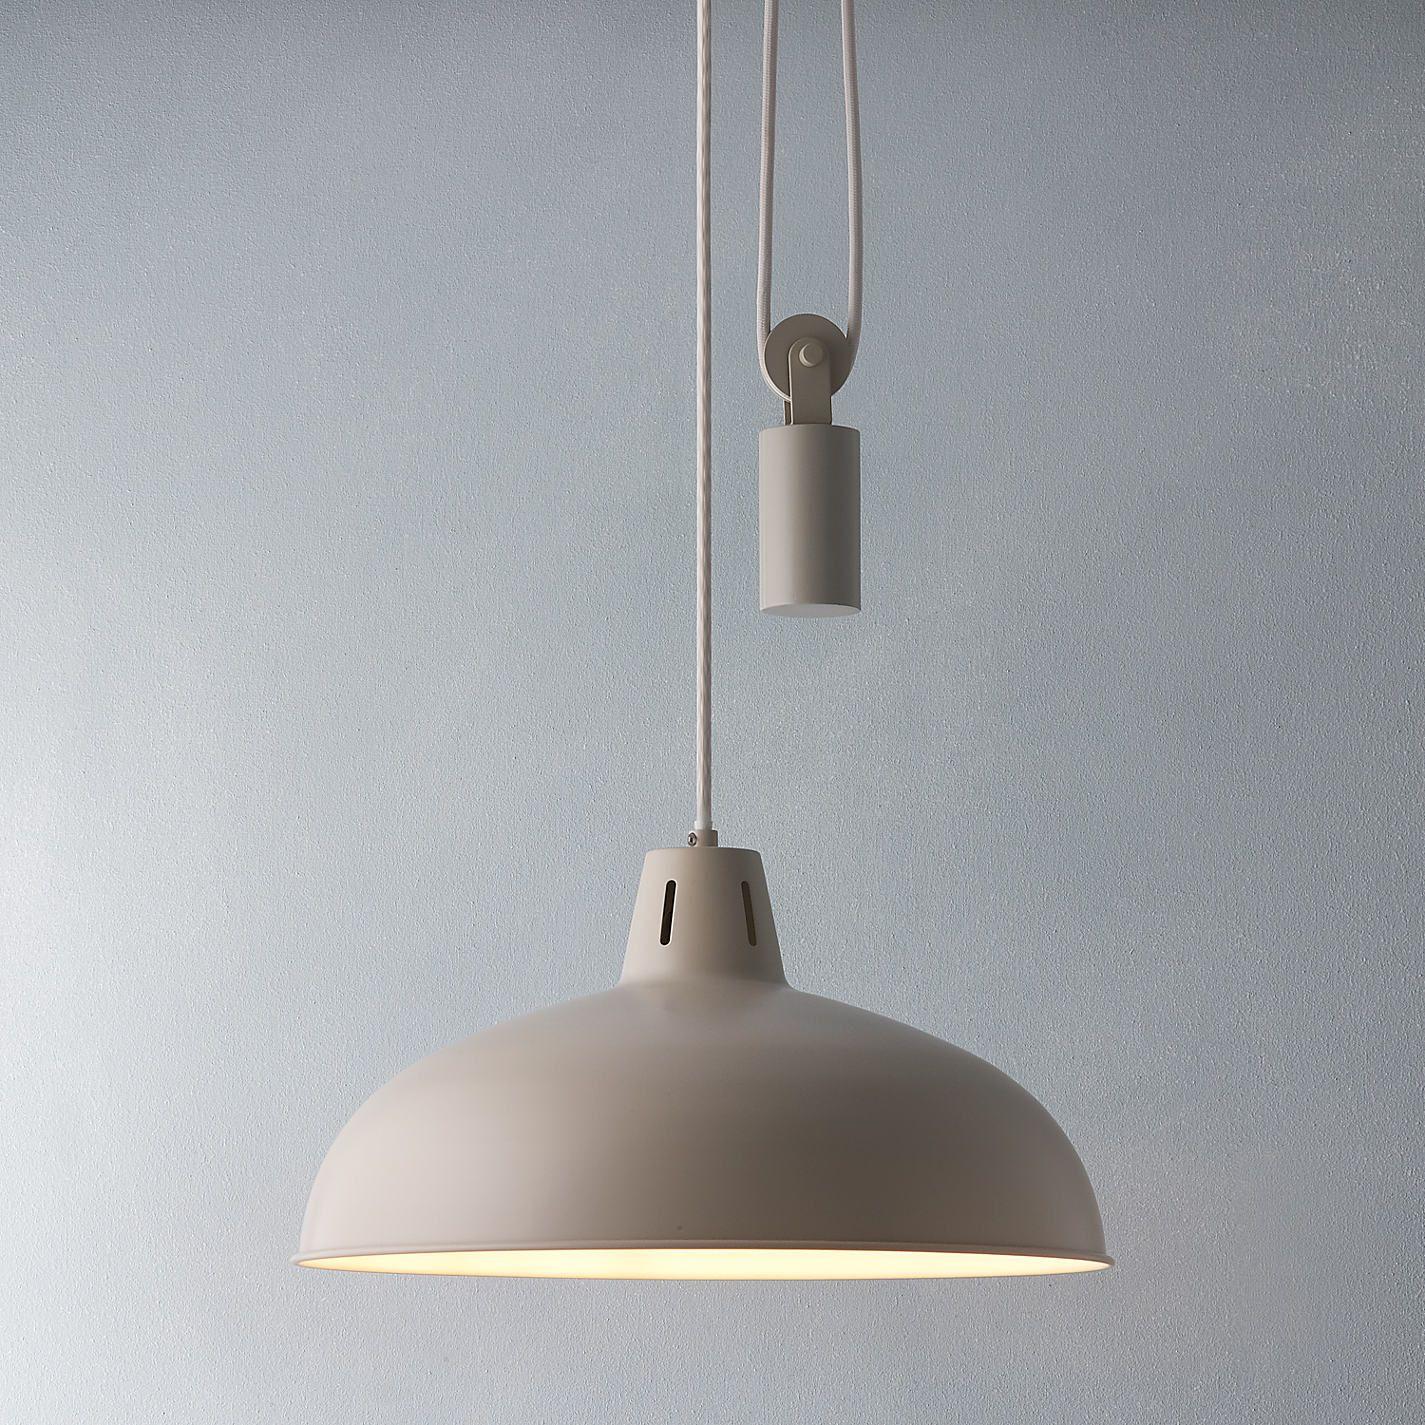 Kitchen Light Fittings John Lewis: Buy Product Retractable Pendant Light John Lewis Brigitta